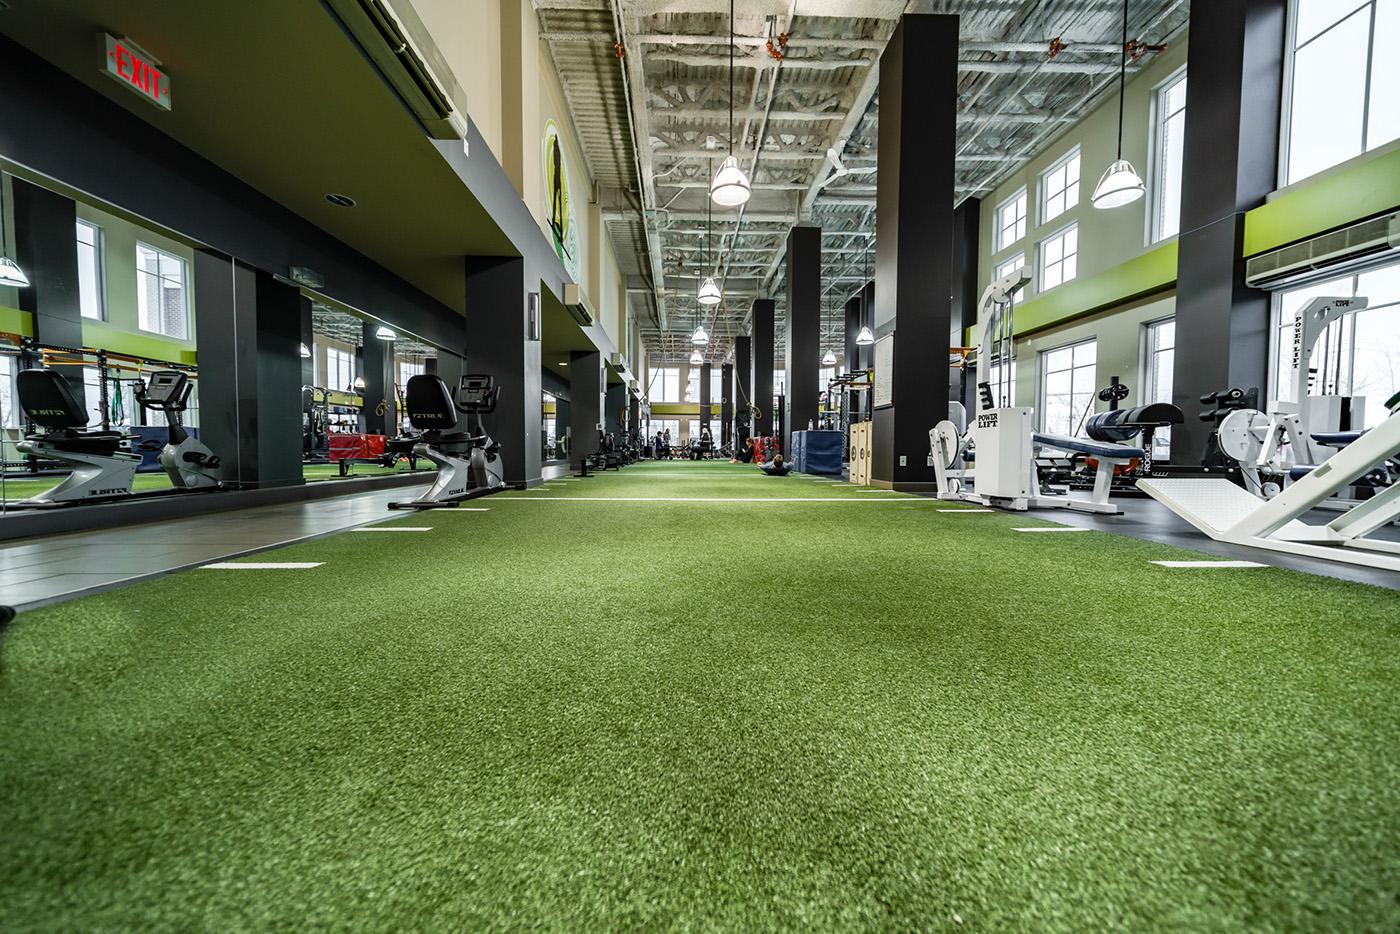 cityfit-gym-personal-training-calgary-workout-facility-inglewood-5.jpg